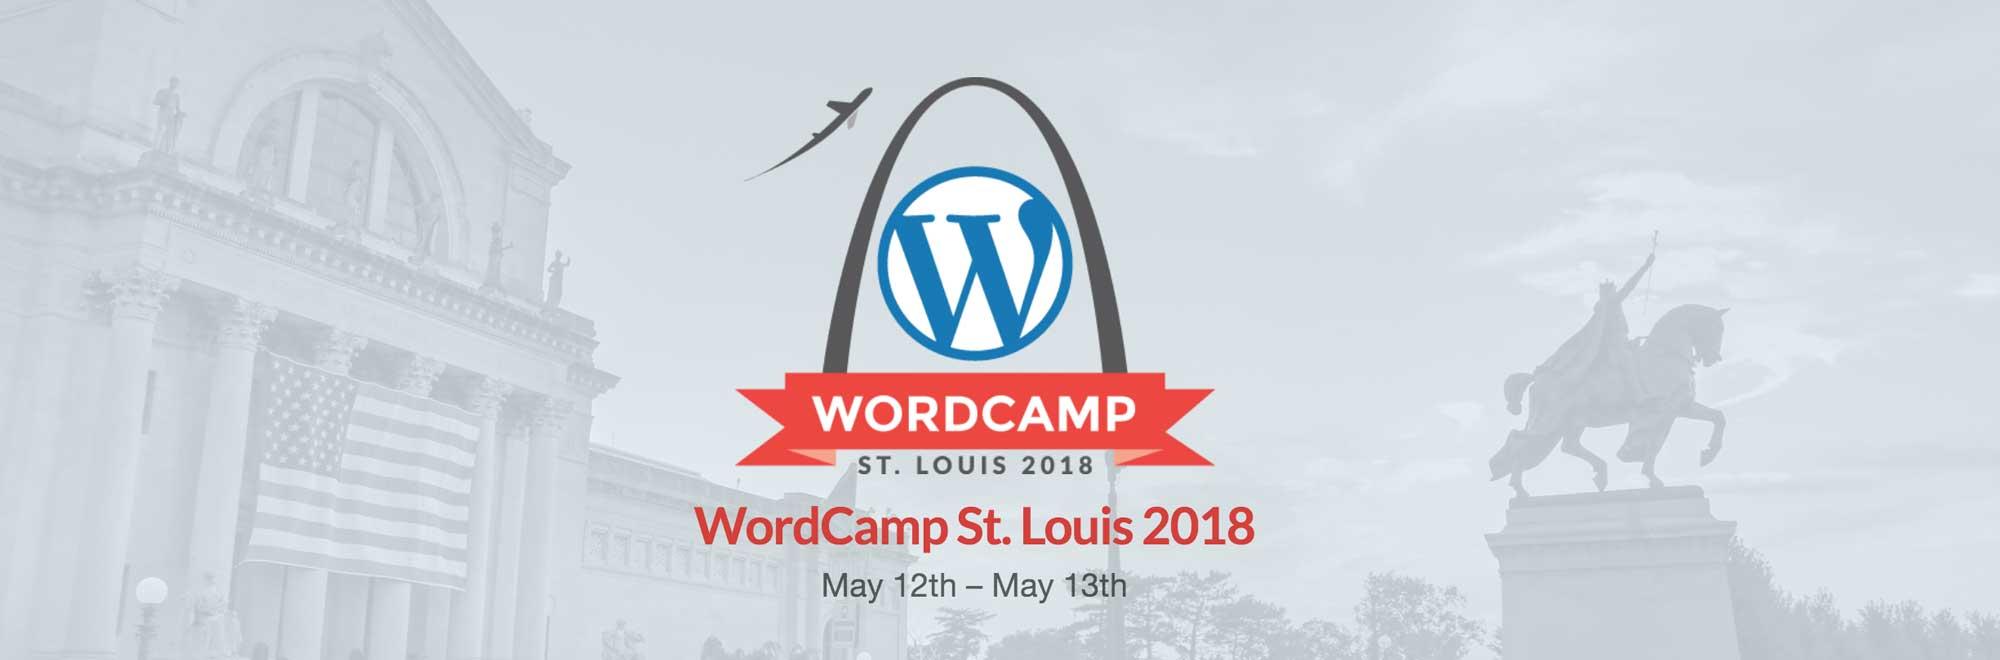 WordCamp St Louis 2018